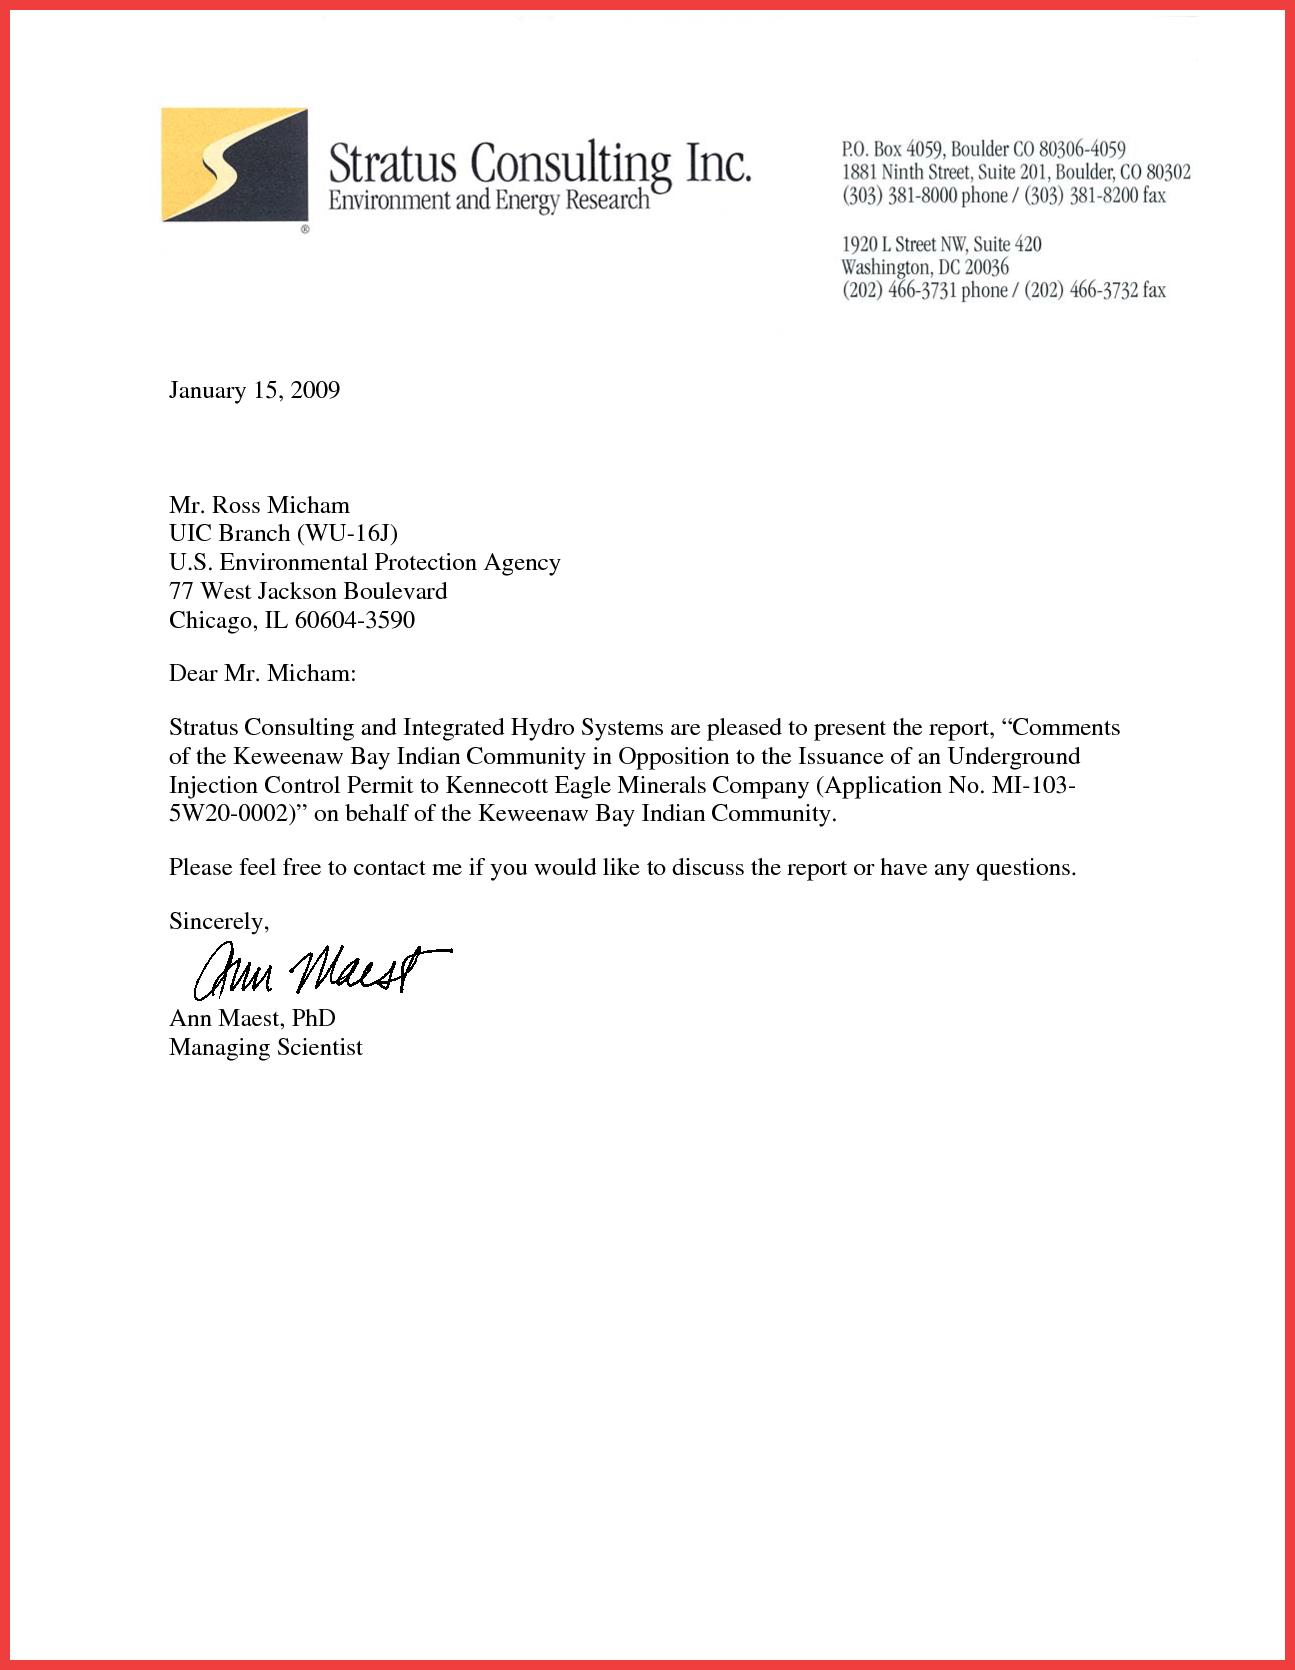 Word Formal Letter Template | Memo Example Regarding Memo Template Word 2013